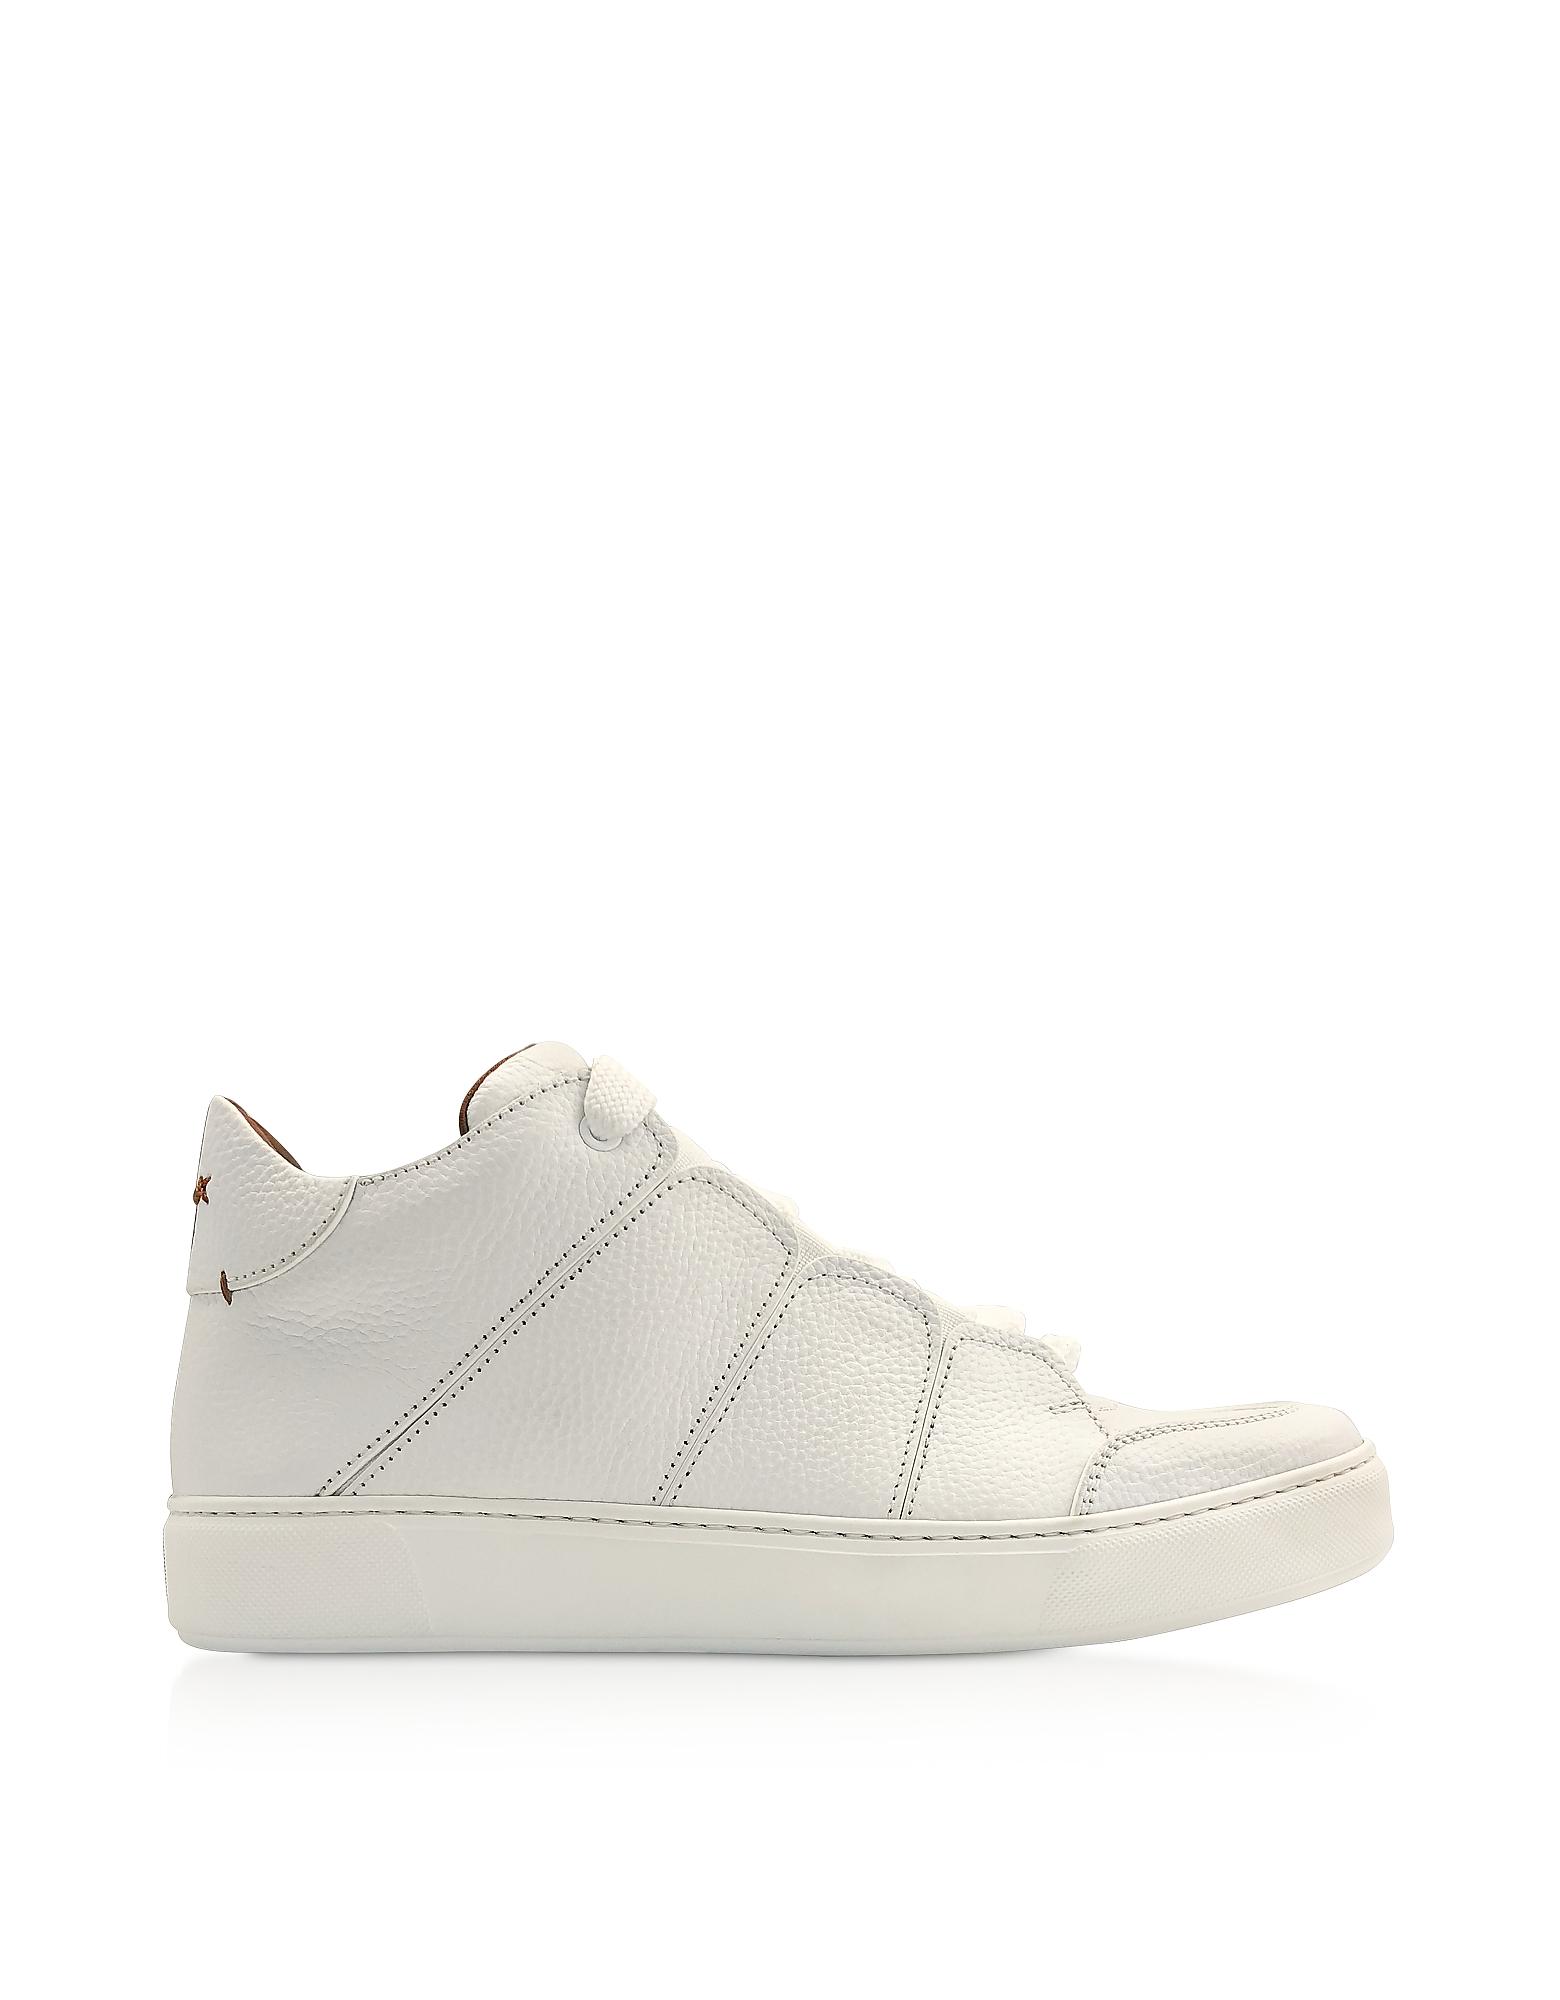 Ermenegildo Zegna Designer Shoes, White Leather Tiziano High-Top Sneakers